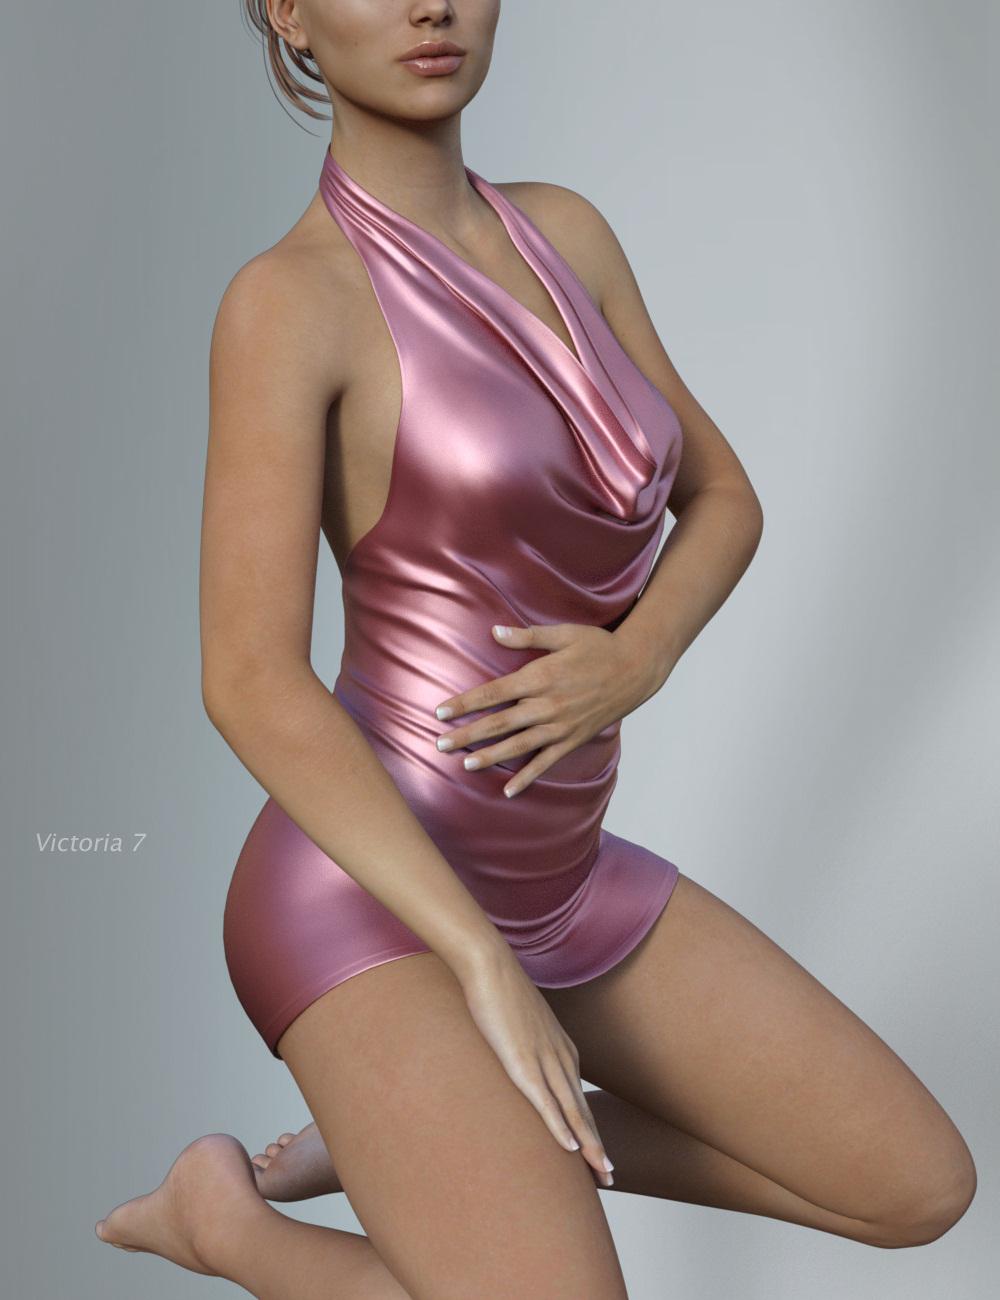 Hongyu's Mini-Dress for Victoria 7 by: hongyu, 3D Models by Daz 3D